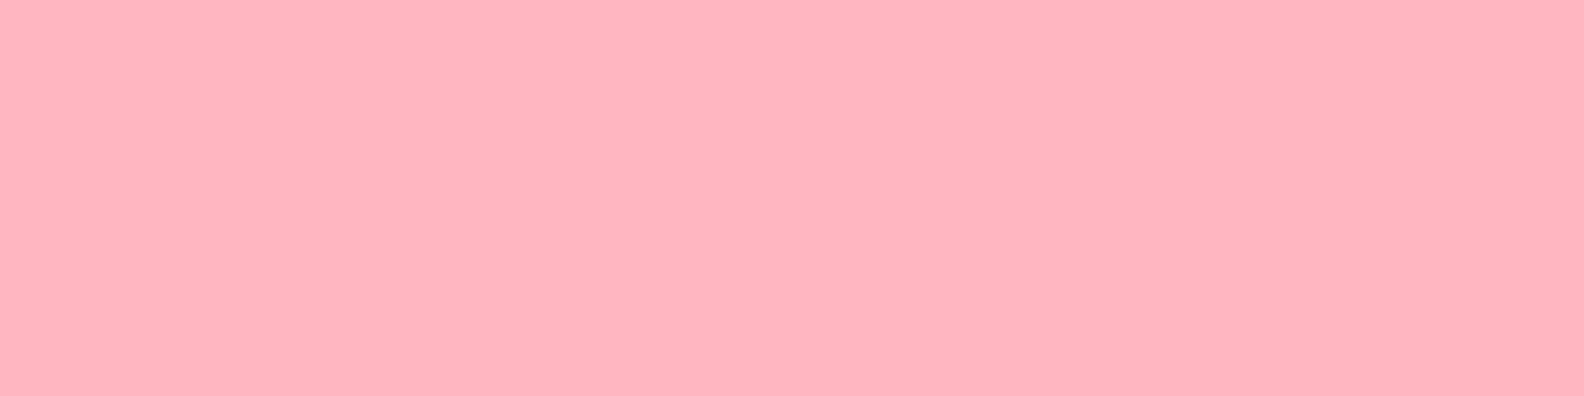 1584x396 Light Pink Solid Color Background